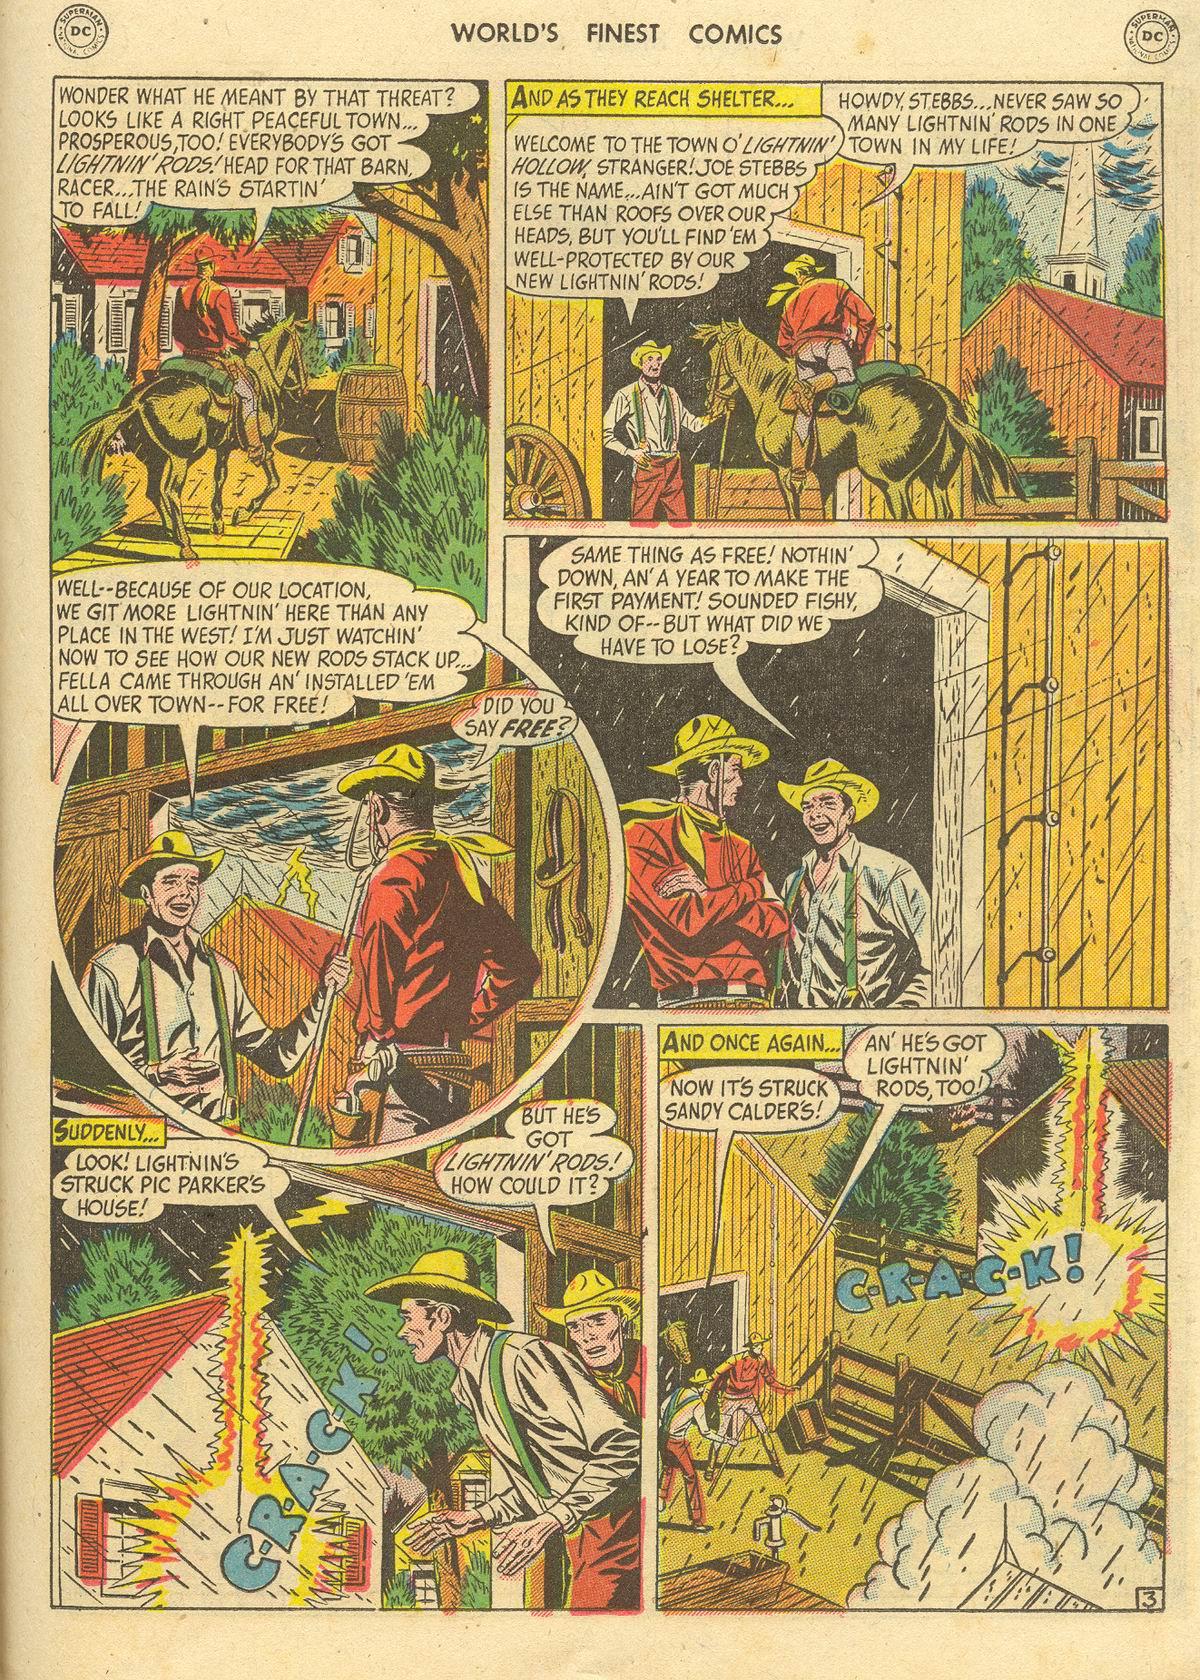 Read online World's Finest Comics comic -  Issue #51 - 45